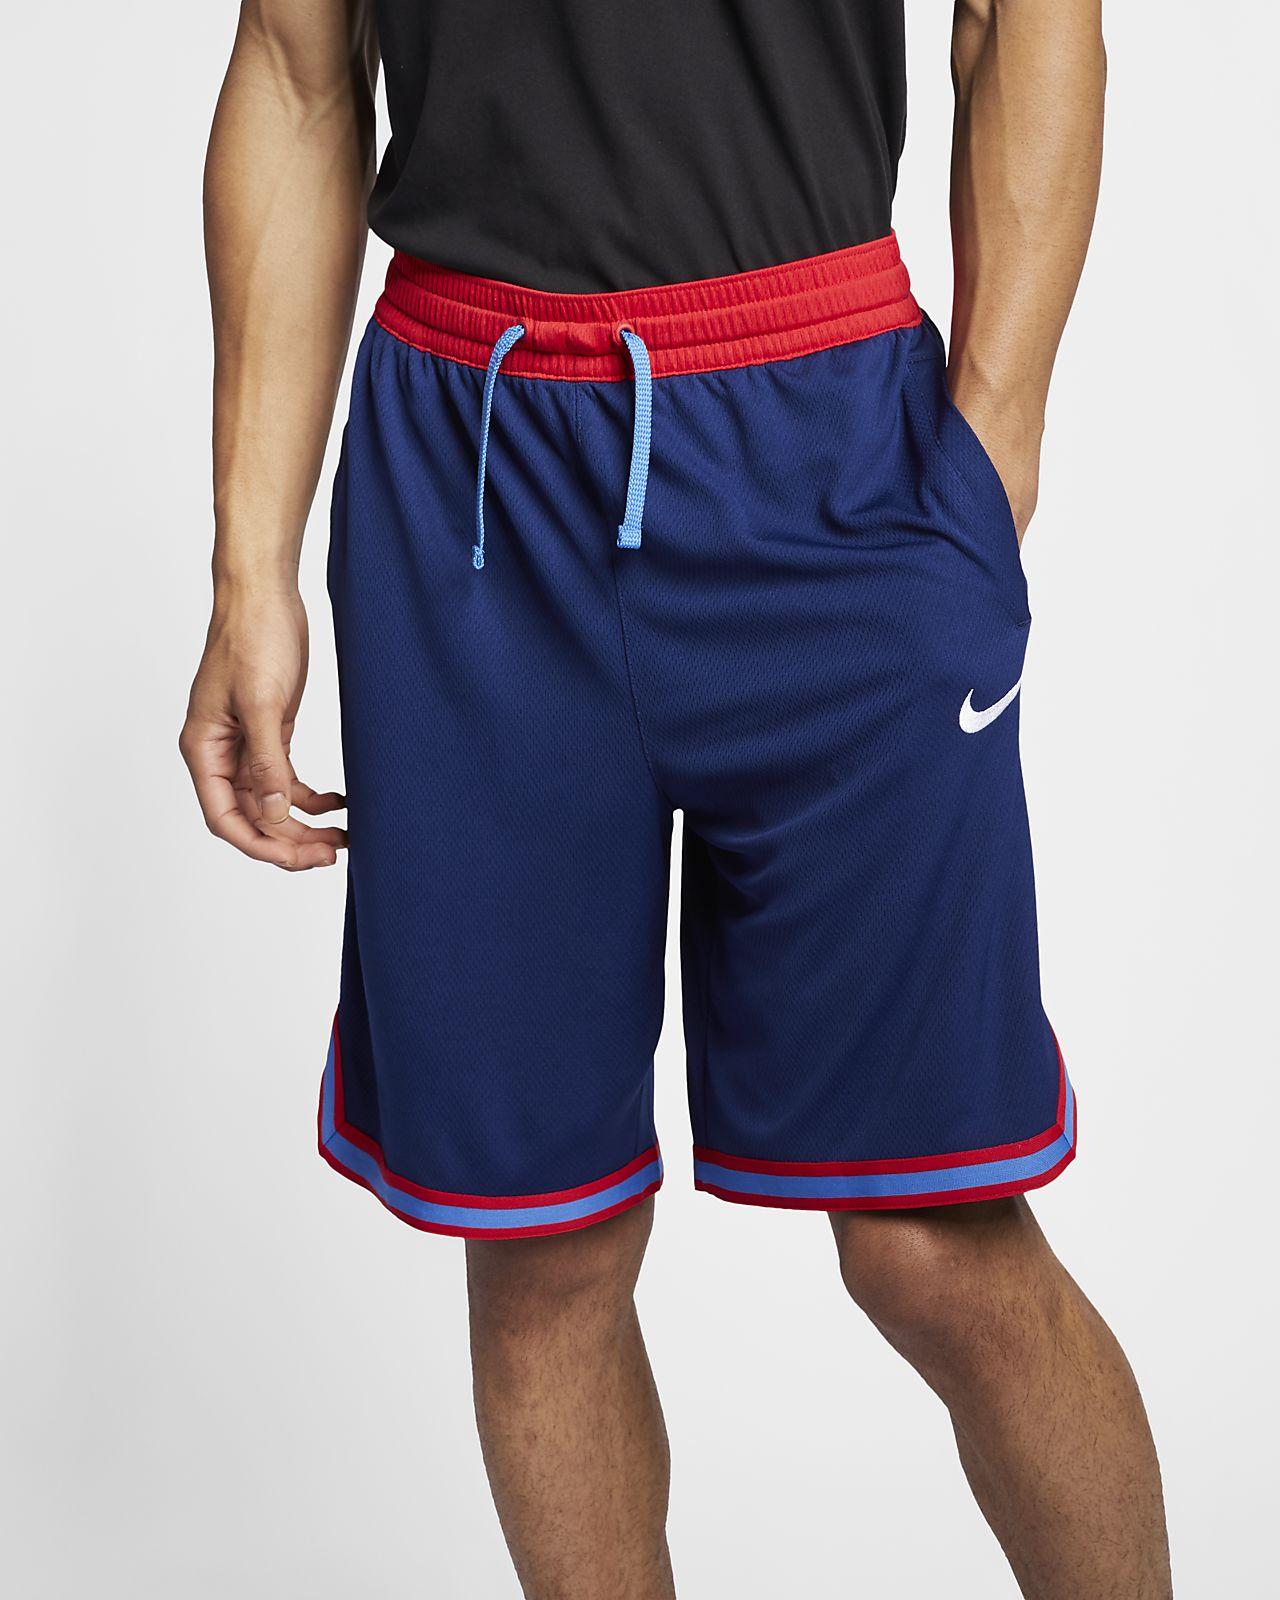 c1b16d4d3f7ace Nike Dri-FIT DNA Men s Basketball Shorts. Nike.com MA